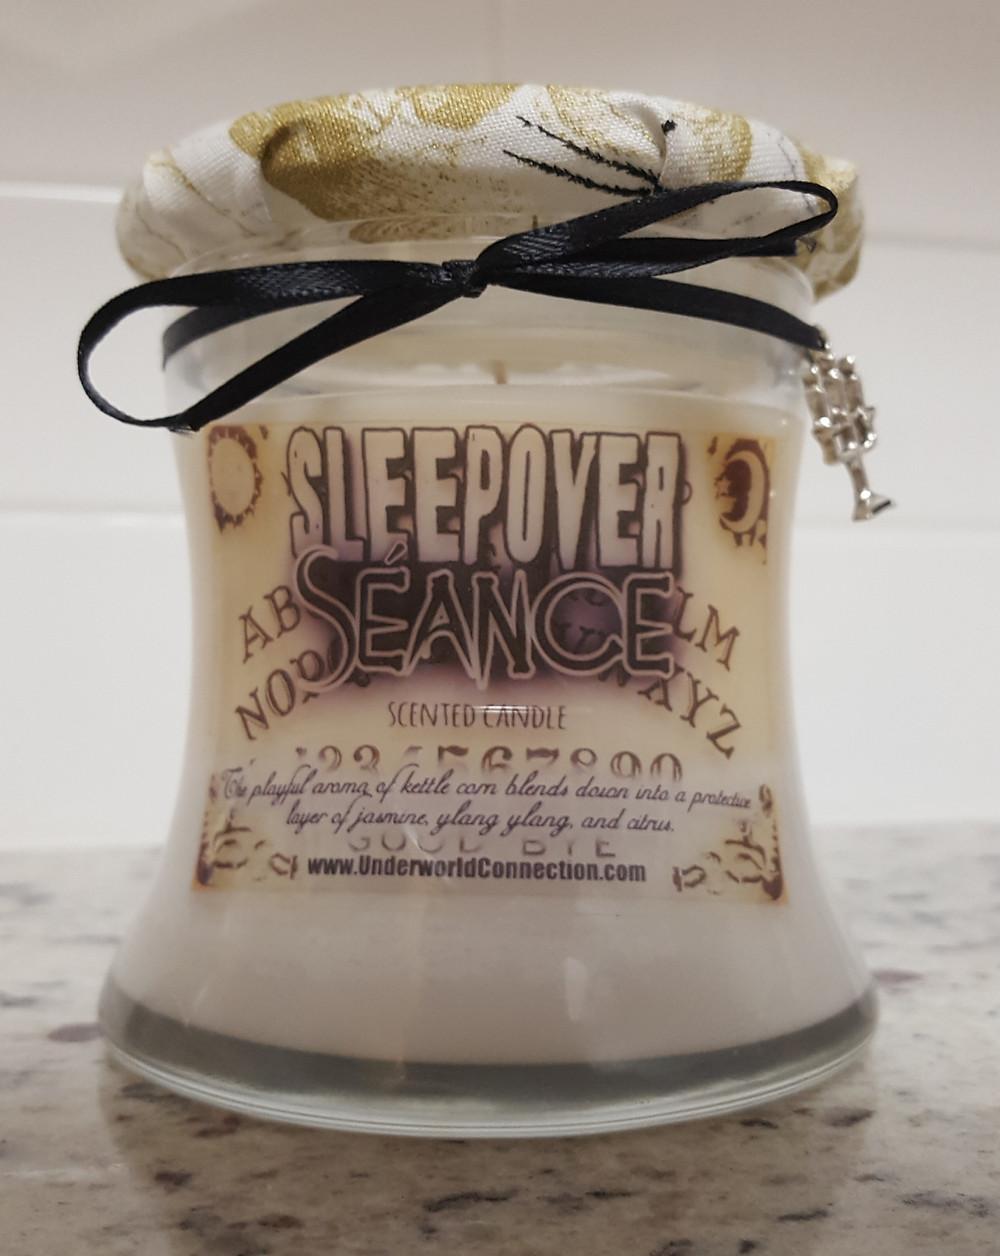 Sleepover Seance Candle